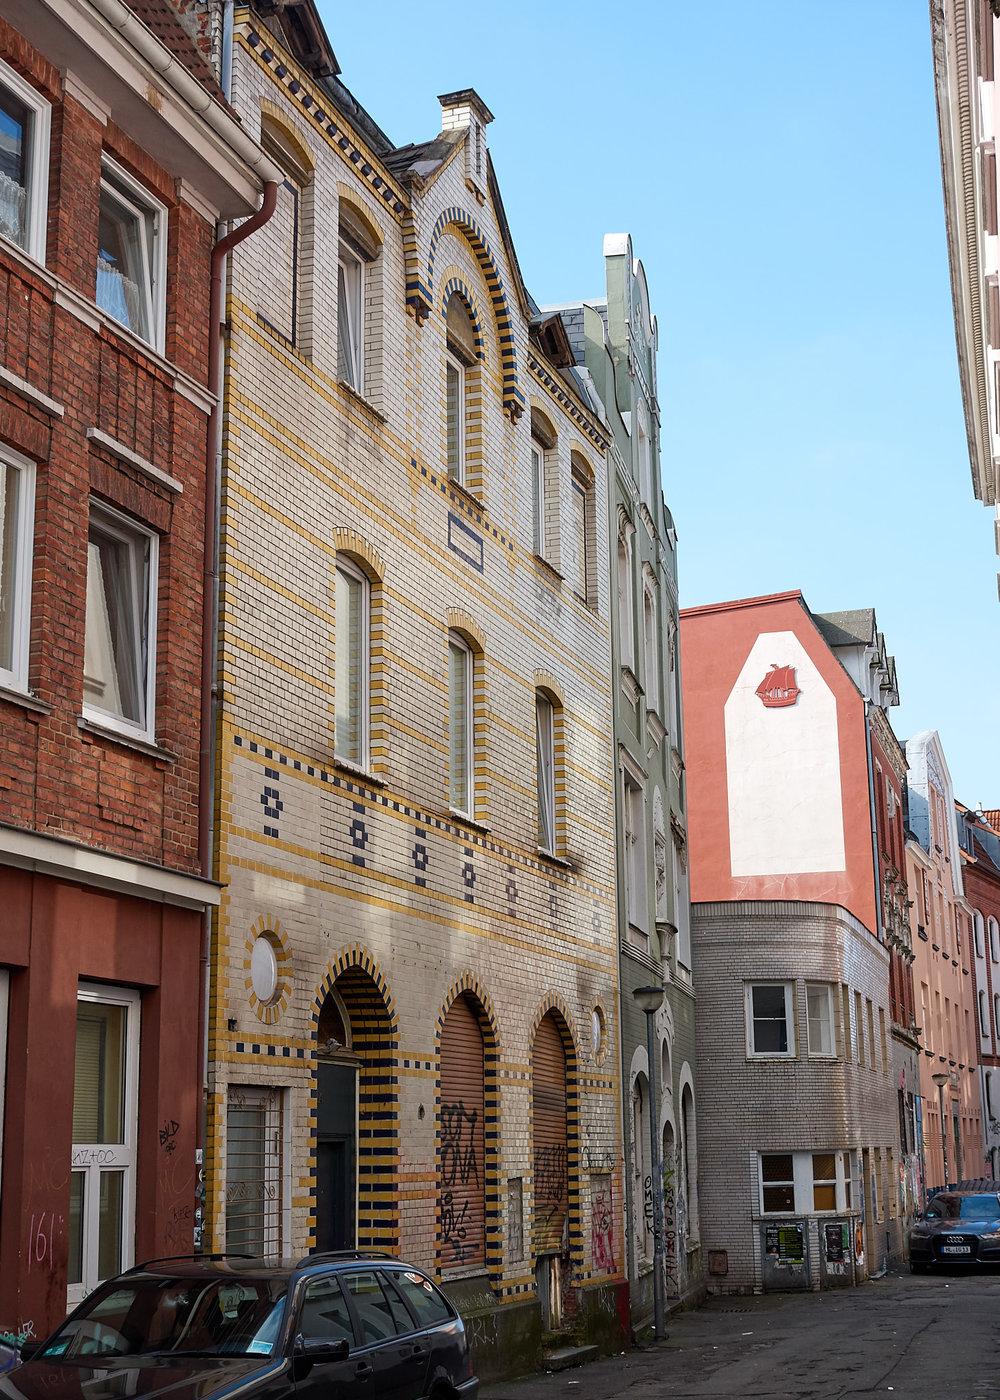 20190330-Lübeck-327.jpg